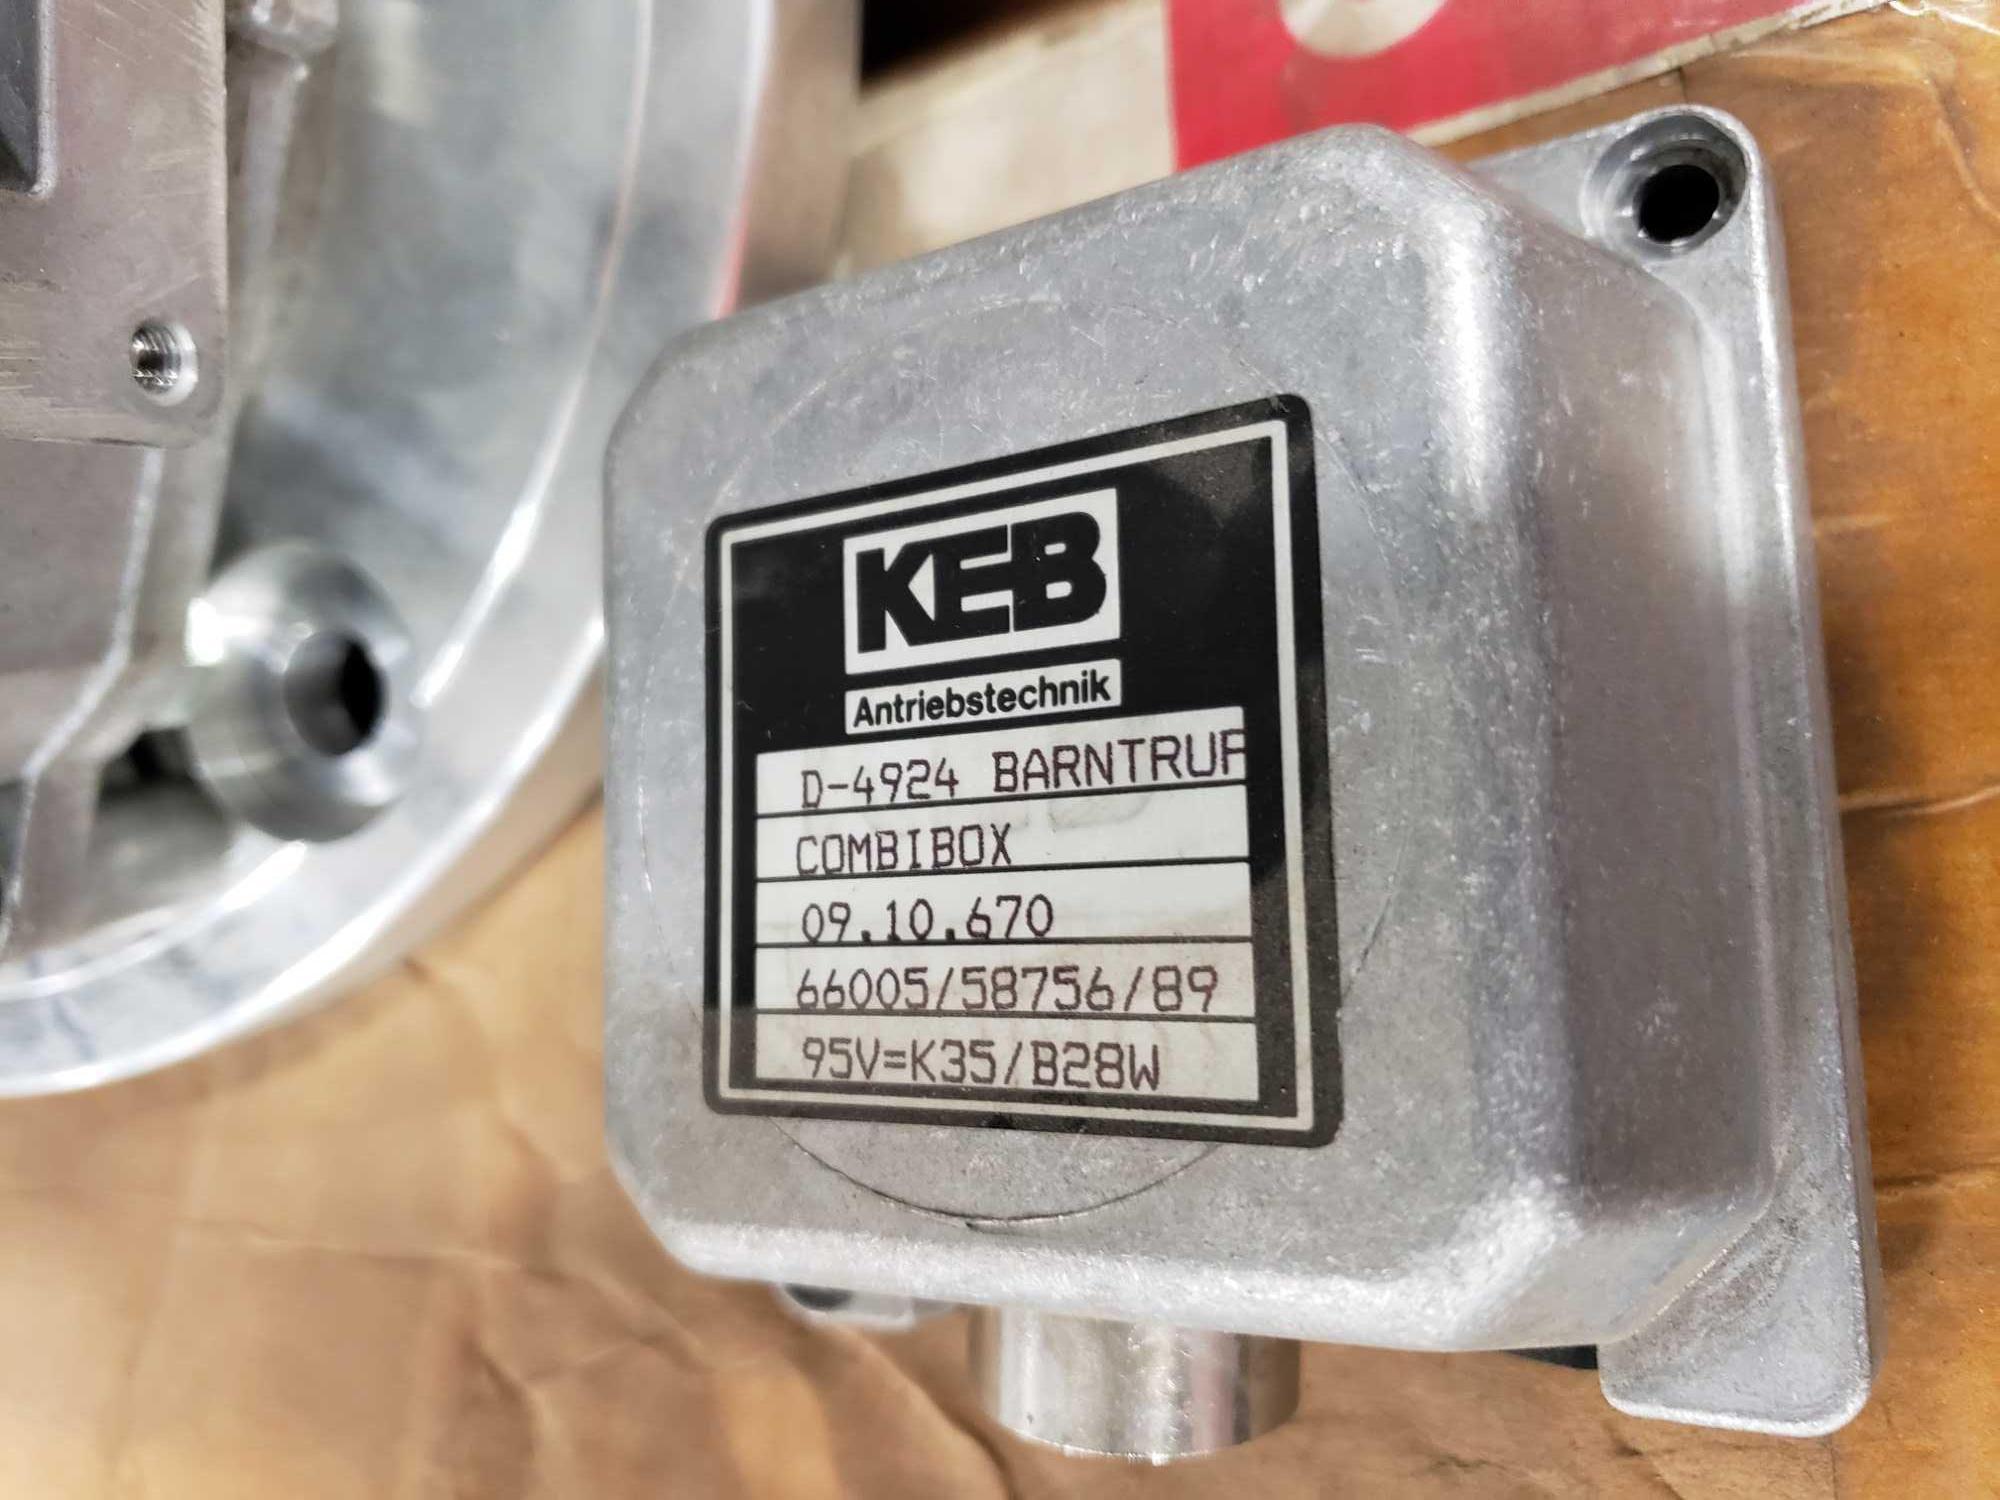 KEB Combibox model 09.10-670. New in box. - Image 2 of 3